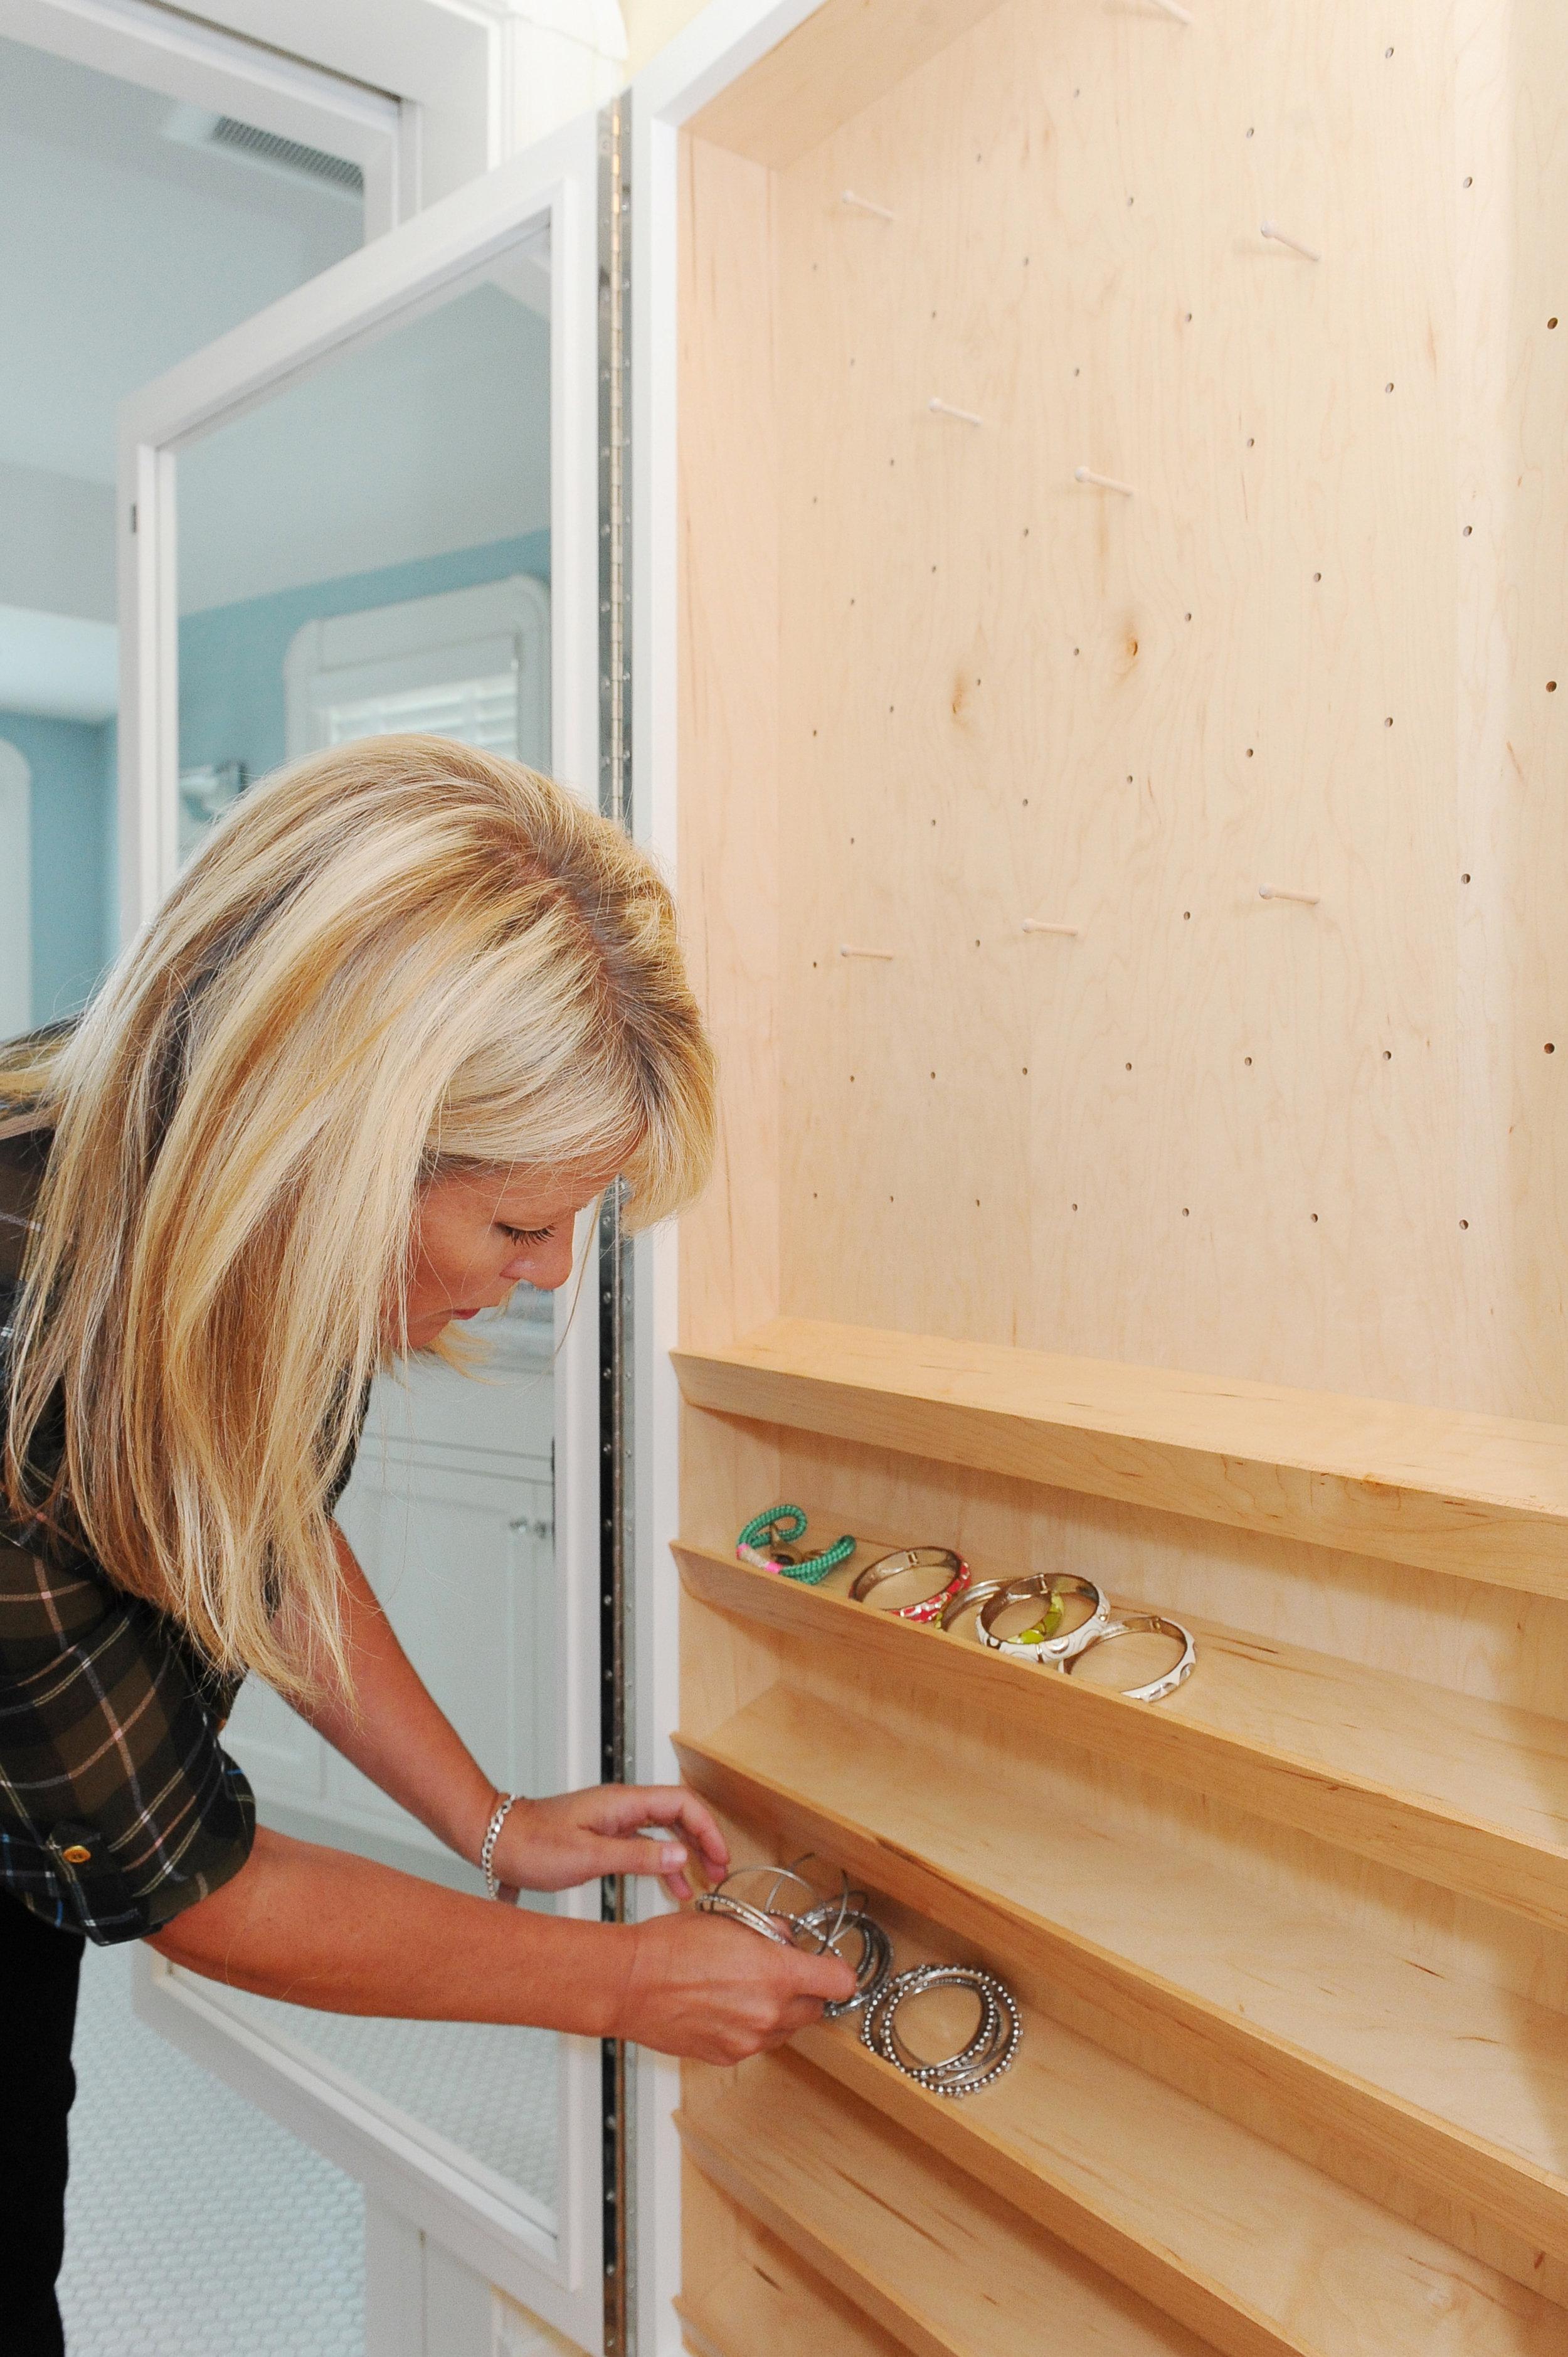 angled display trays for bangles and more